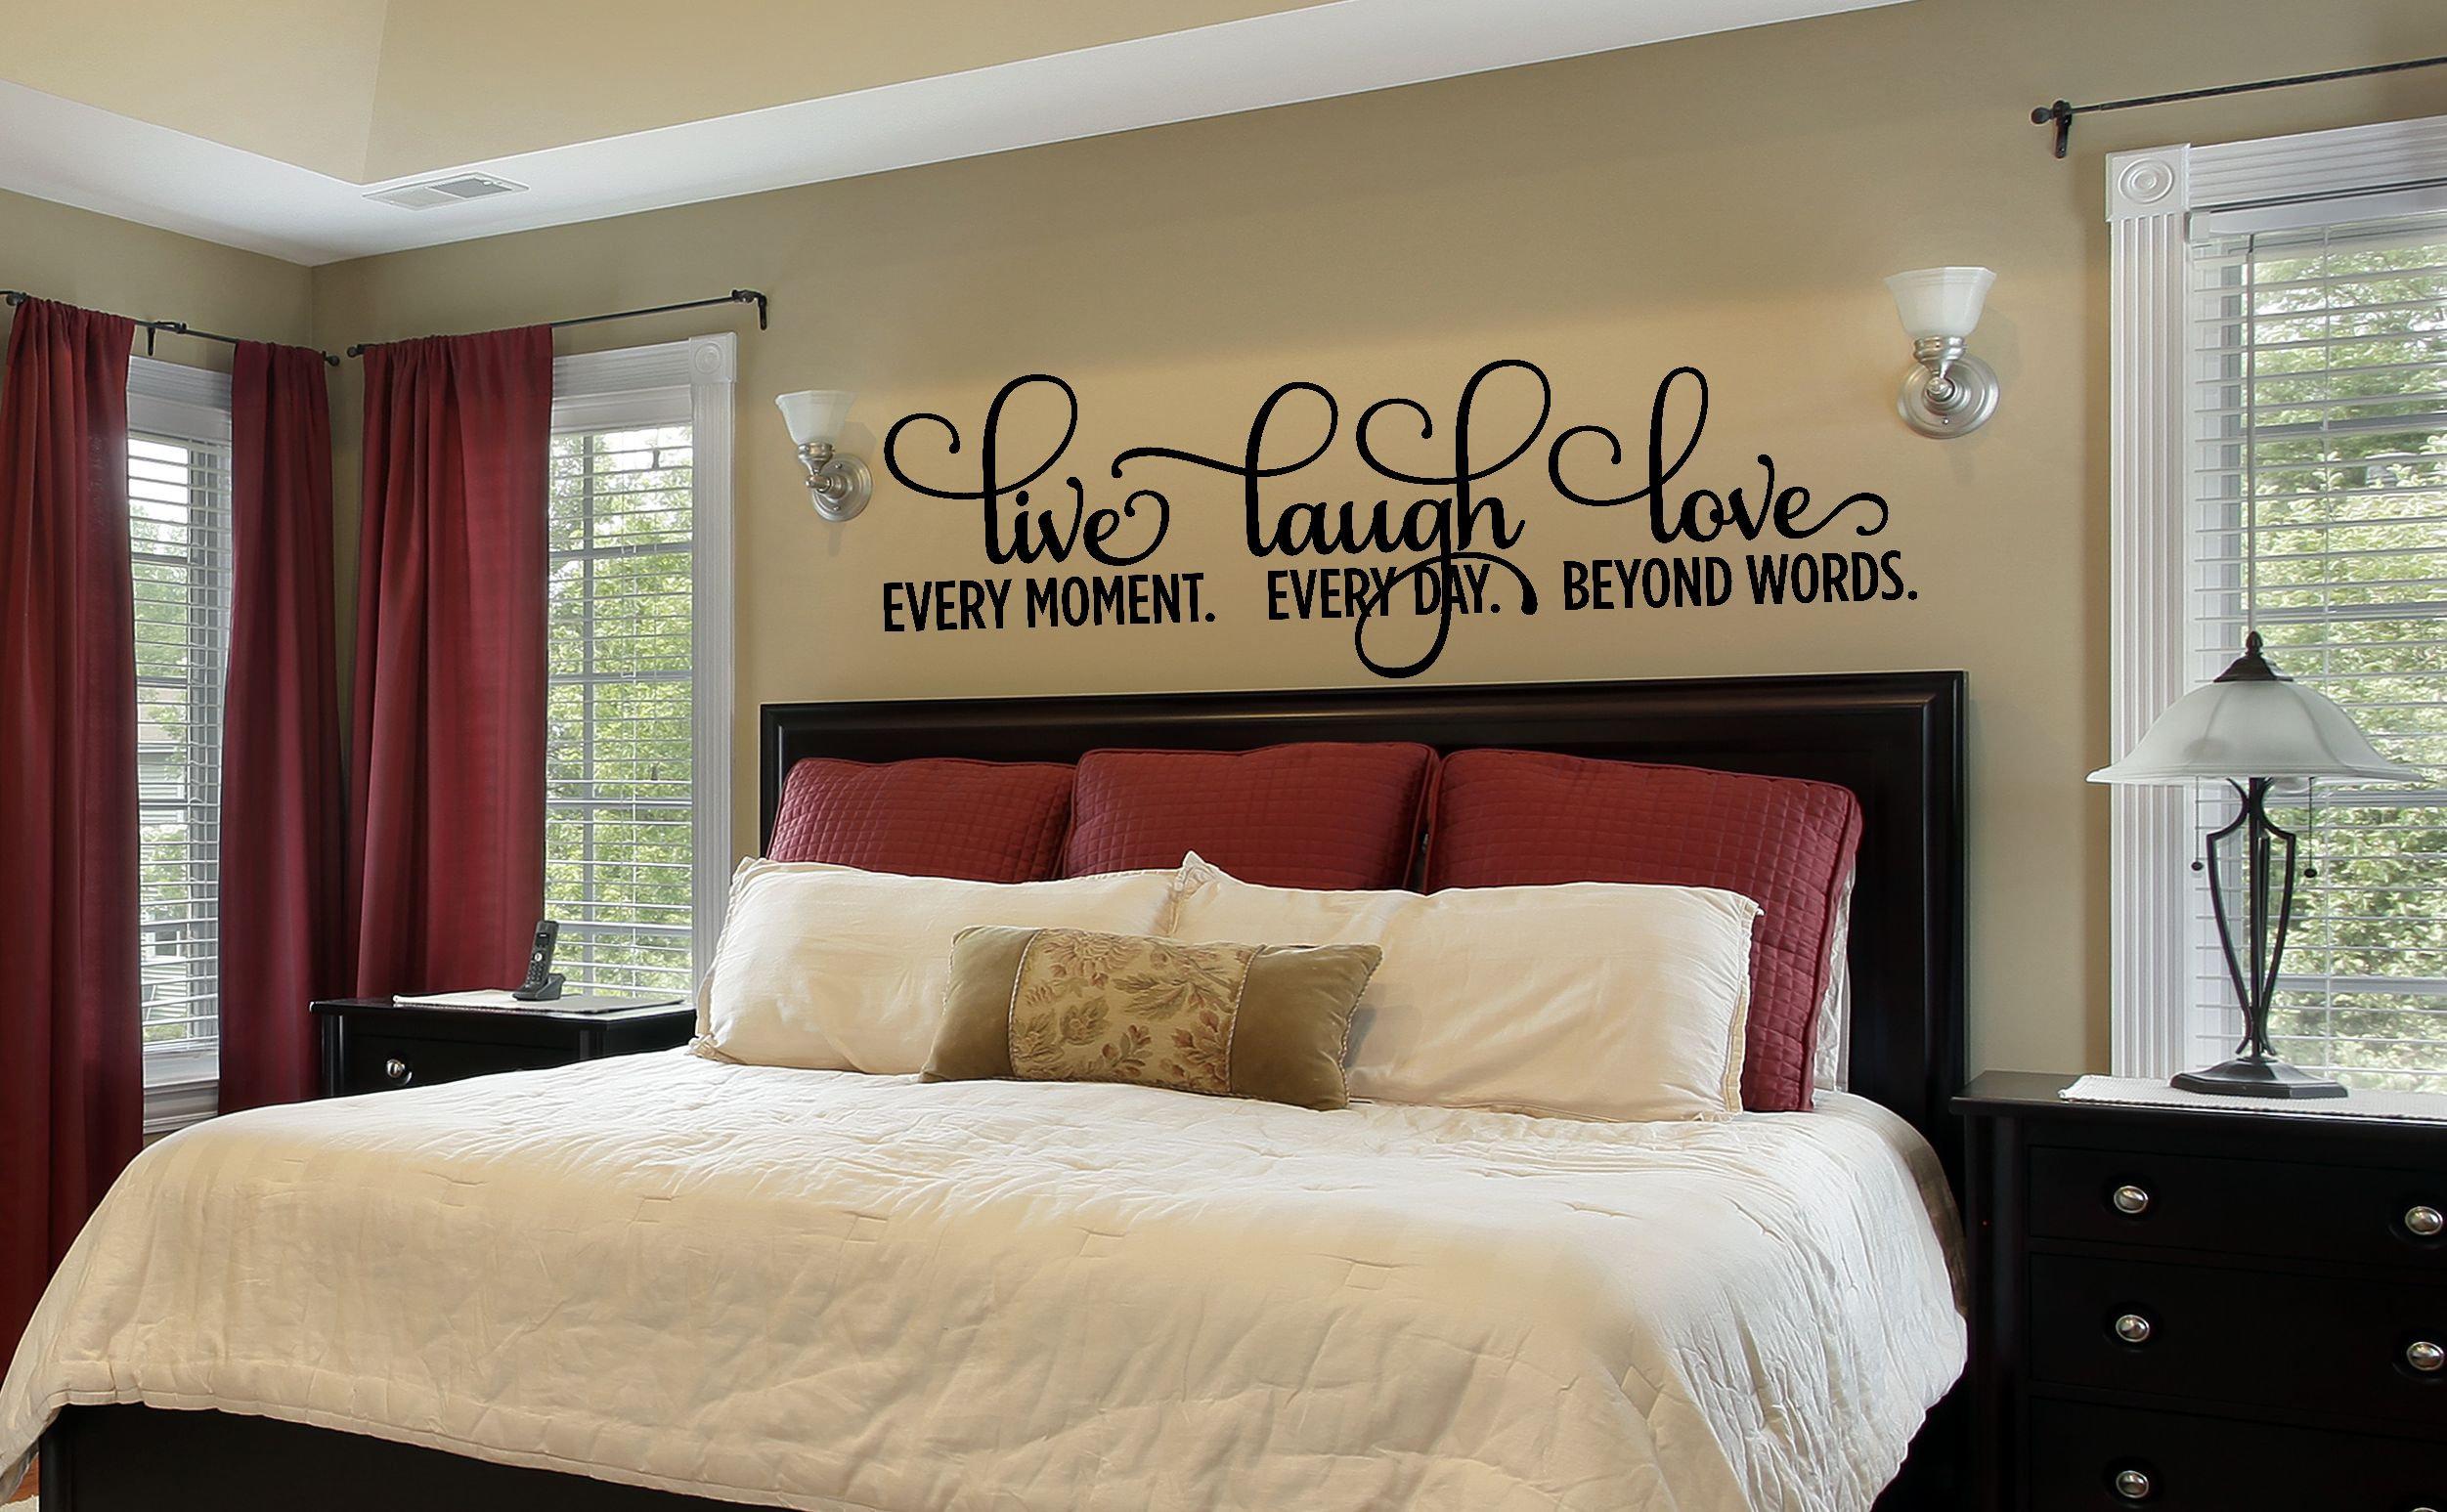 Bedroom Decor Bedroom Wall Decal Master Bedroom Wall Decal